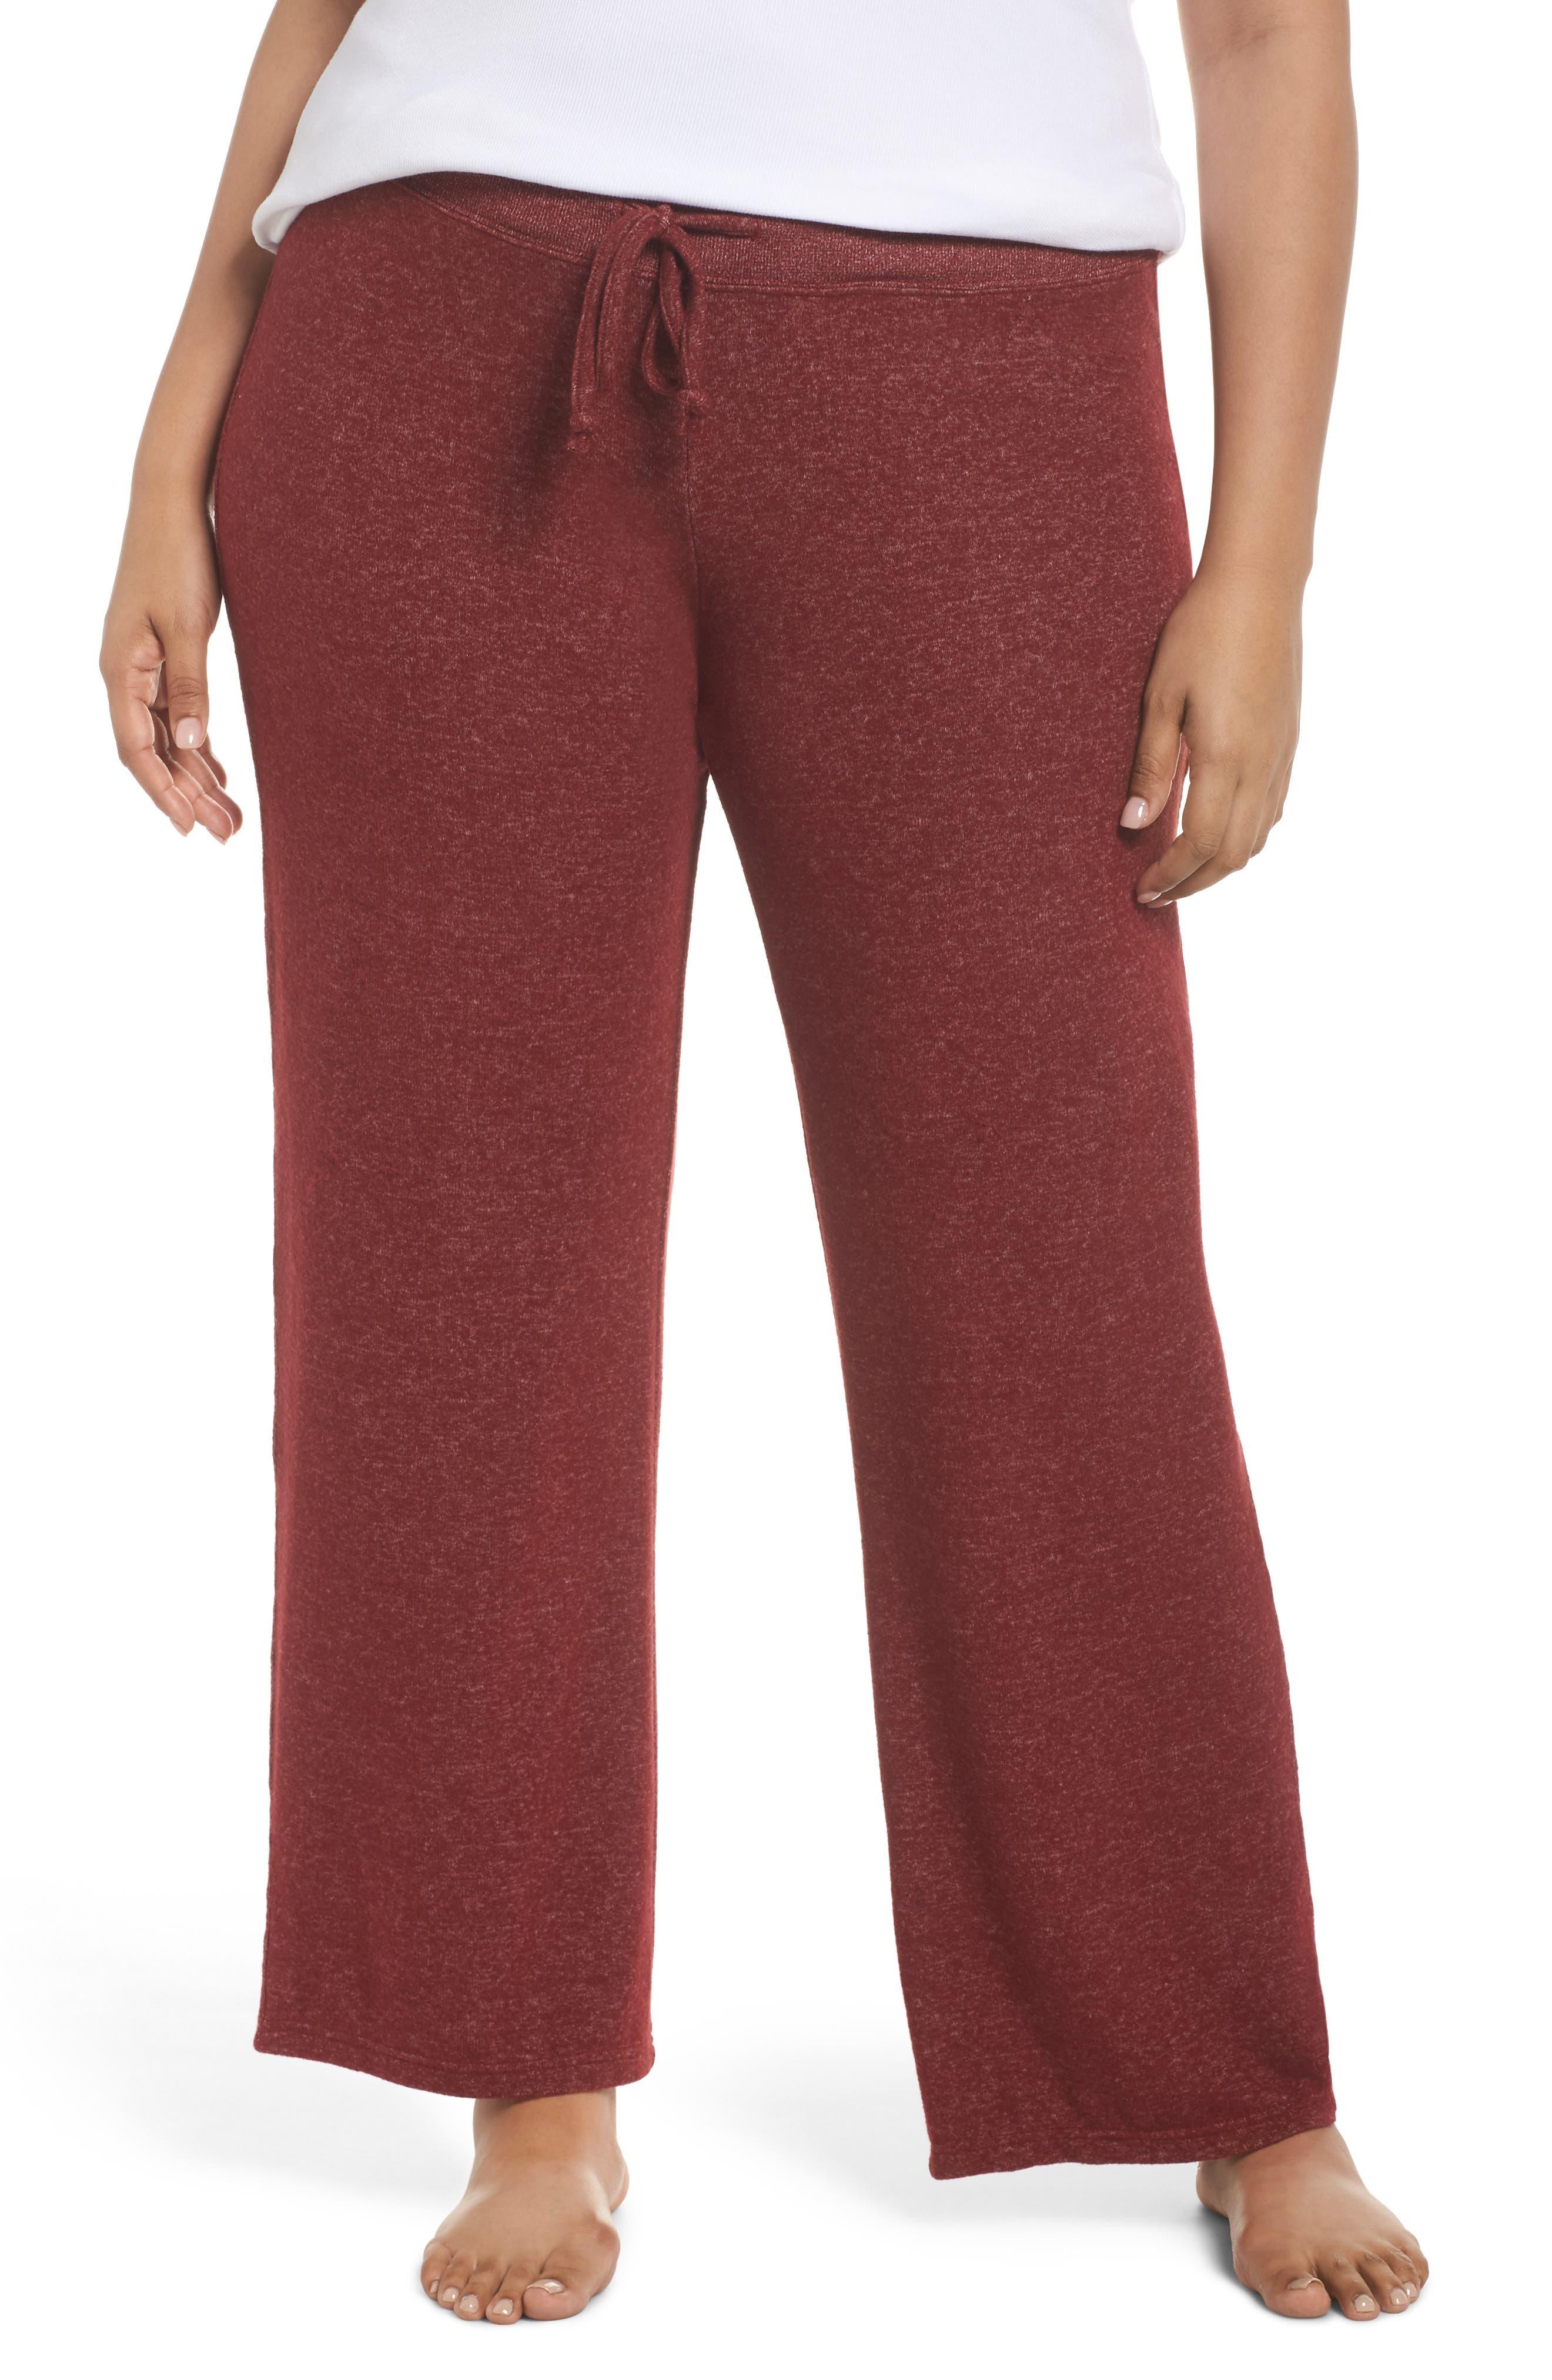 'Best Boyfriend' Brushed Hacci Lounge Pants,                             Main thumbnail 1, color,                             Red Grape